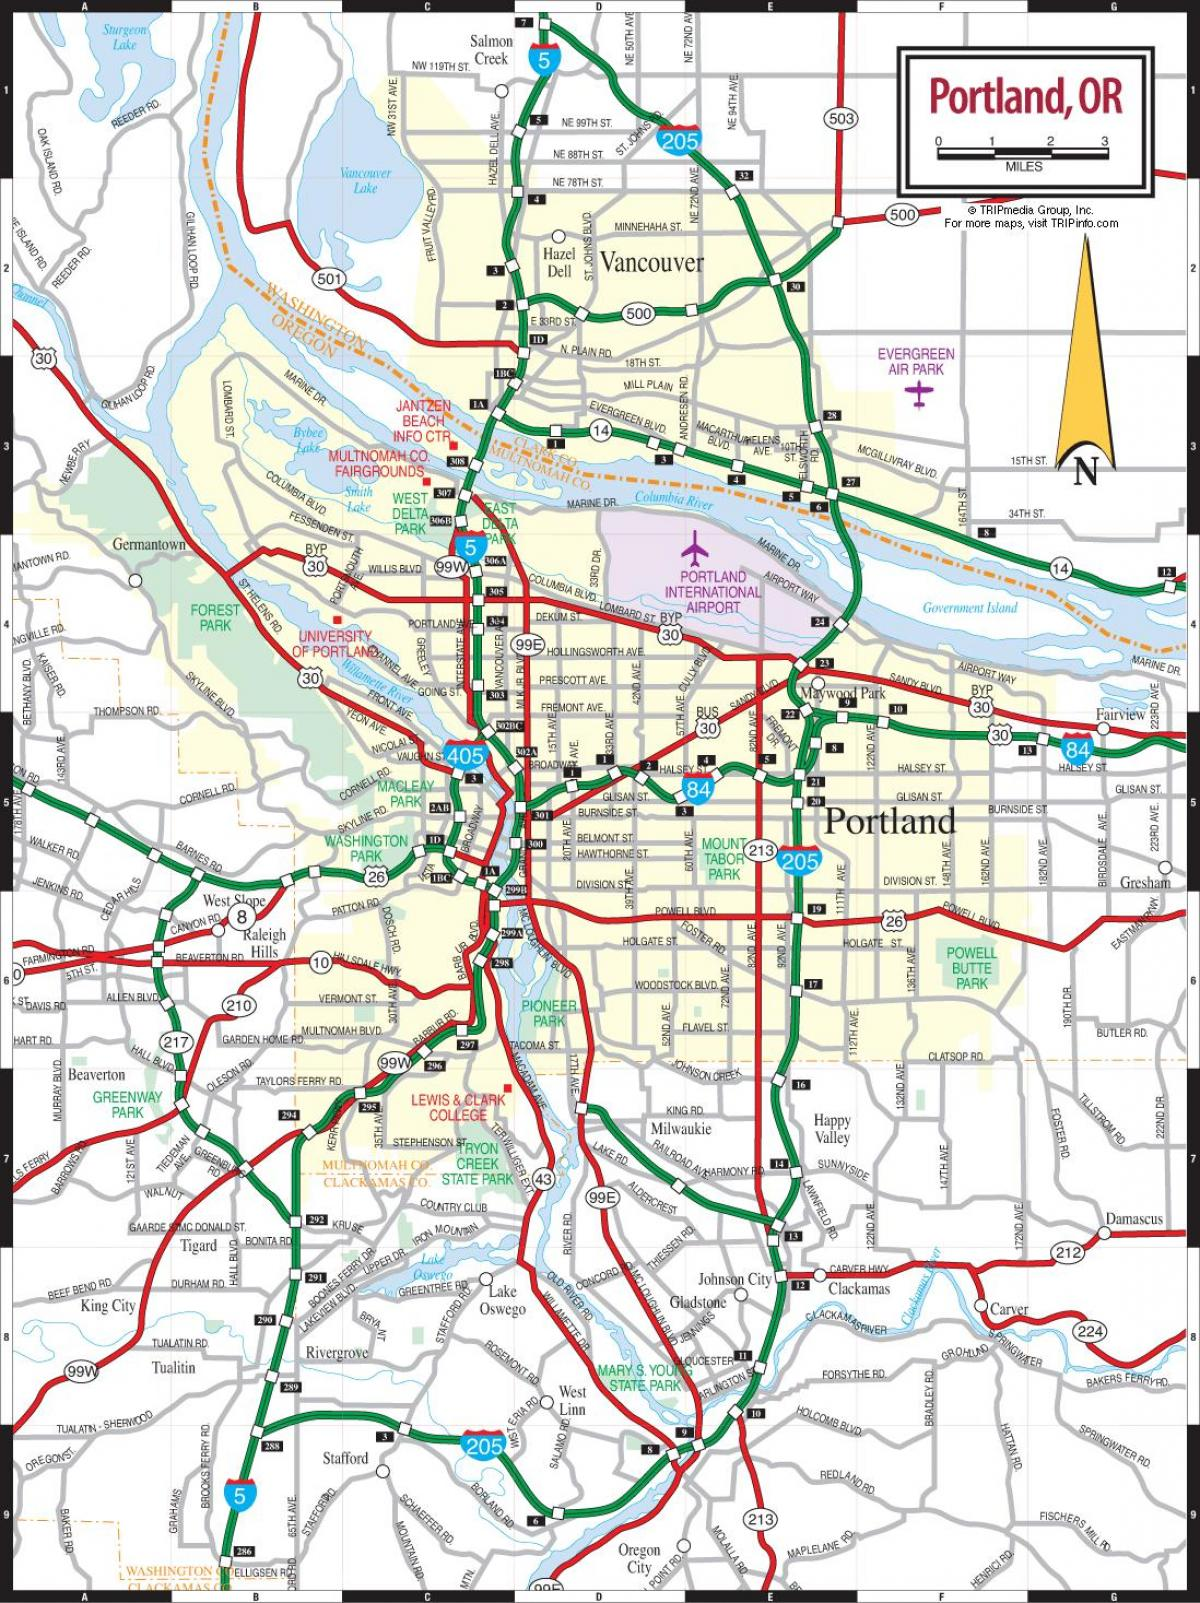 Metro map Portland Oregon Portland Oregon metro map Oregon USA